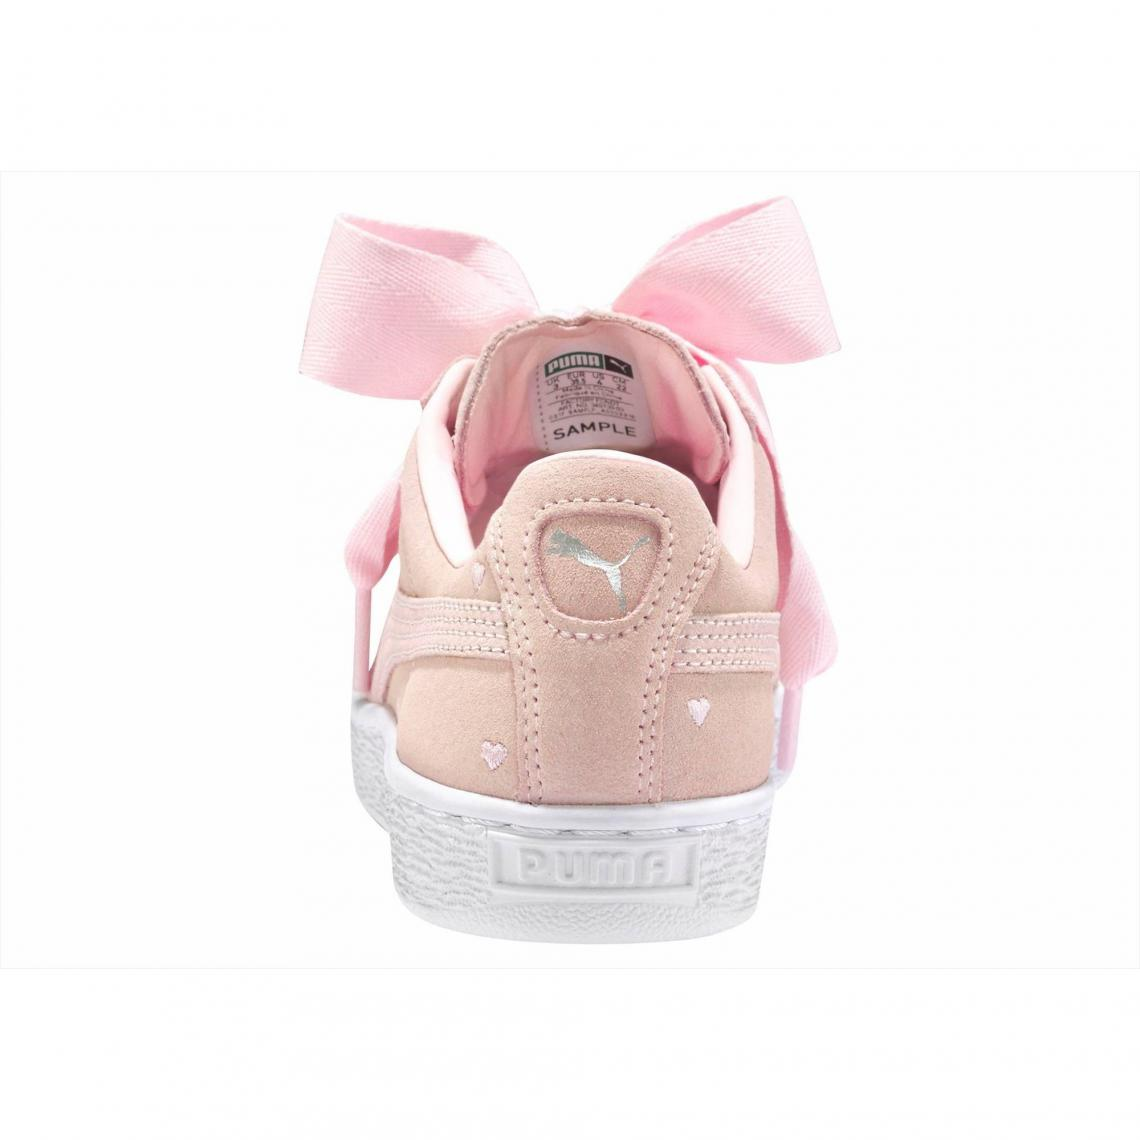 Valentine Fille Puma Chaussures Sport Heart Suede Rosé De Blanc ZgqTwEfY